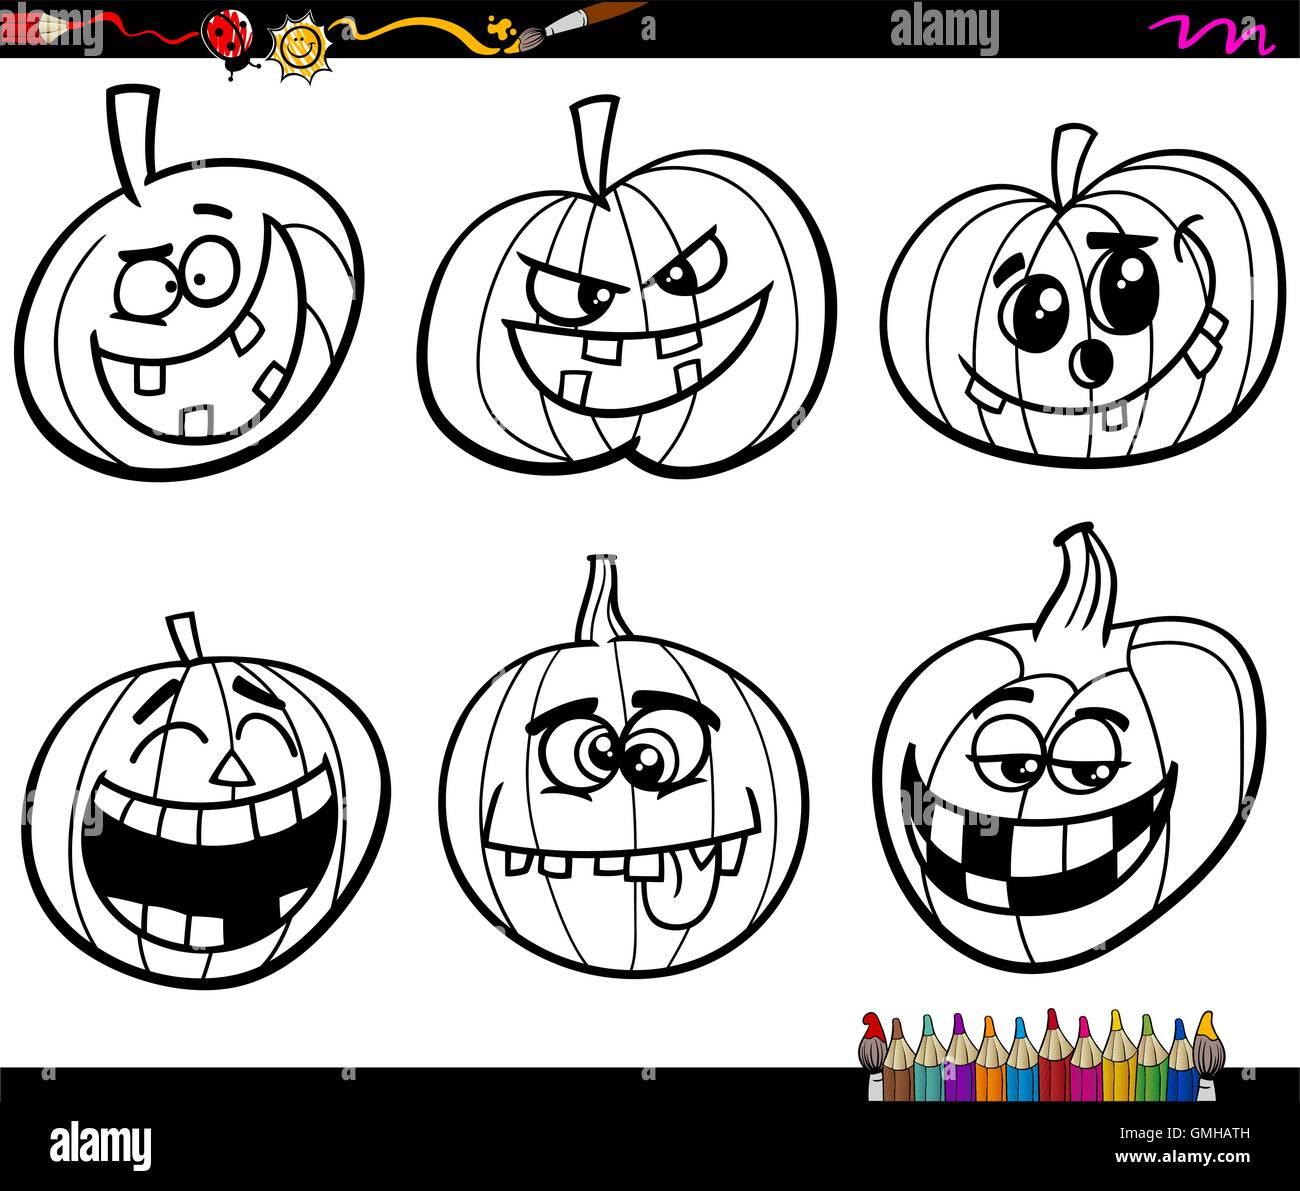 Malvorlagen Halloween-Kürbisse Stock-Vektorgrafik - Alamy